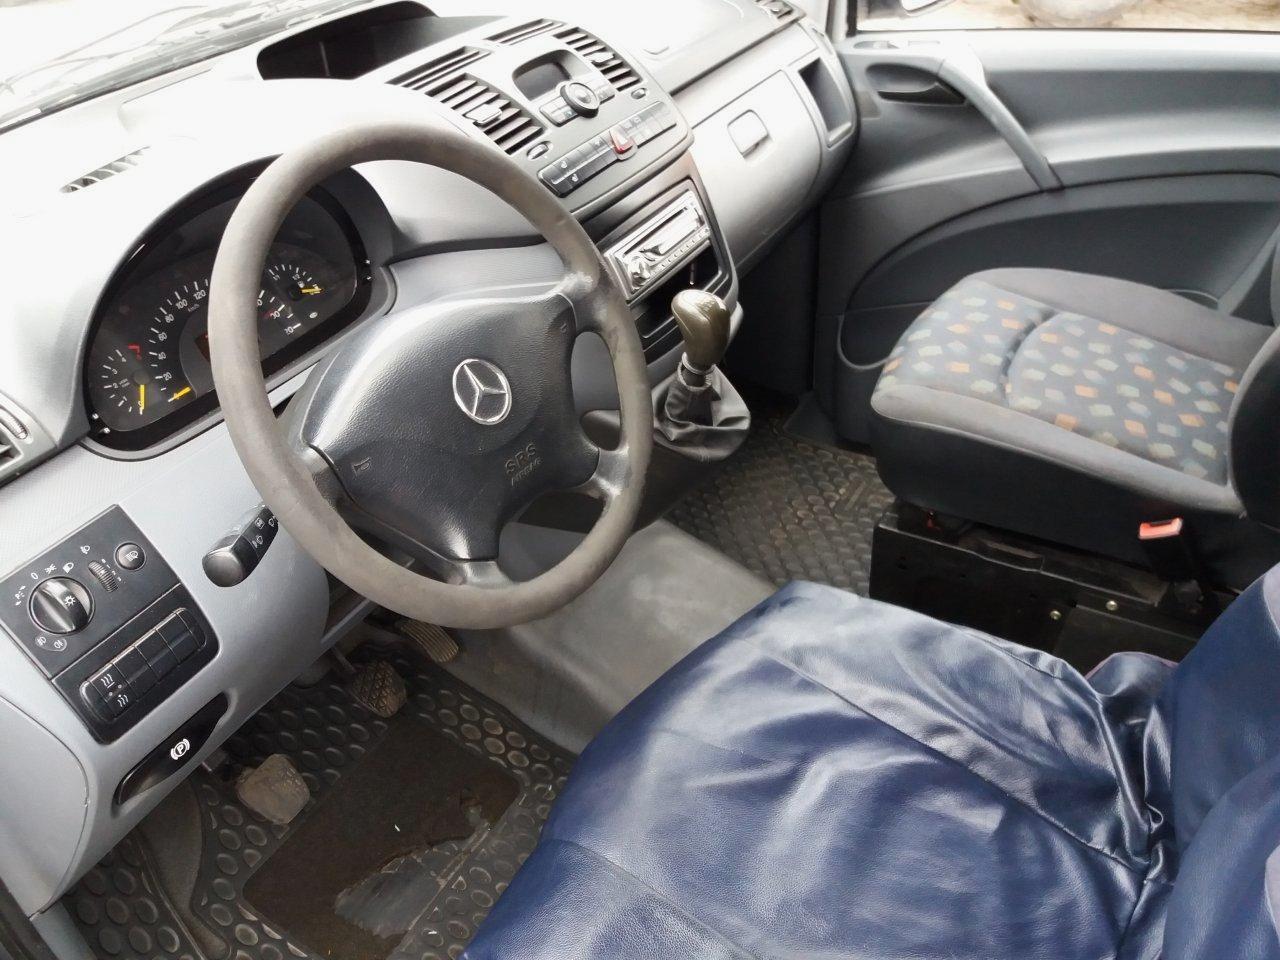 Mercedes-Benz Vito 115Cdi 2004